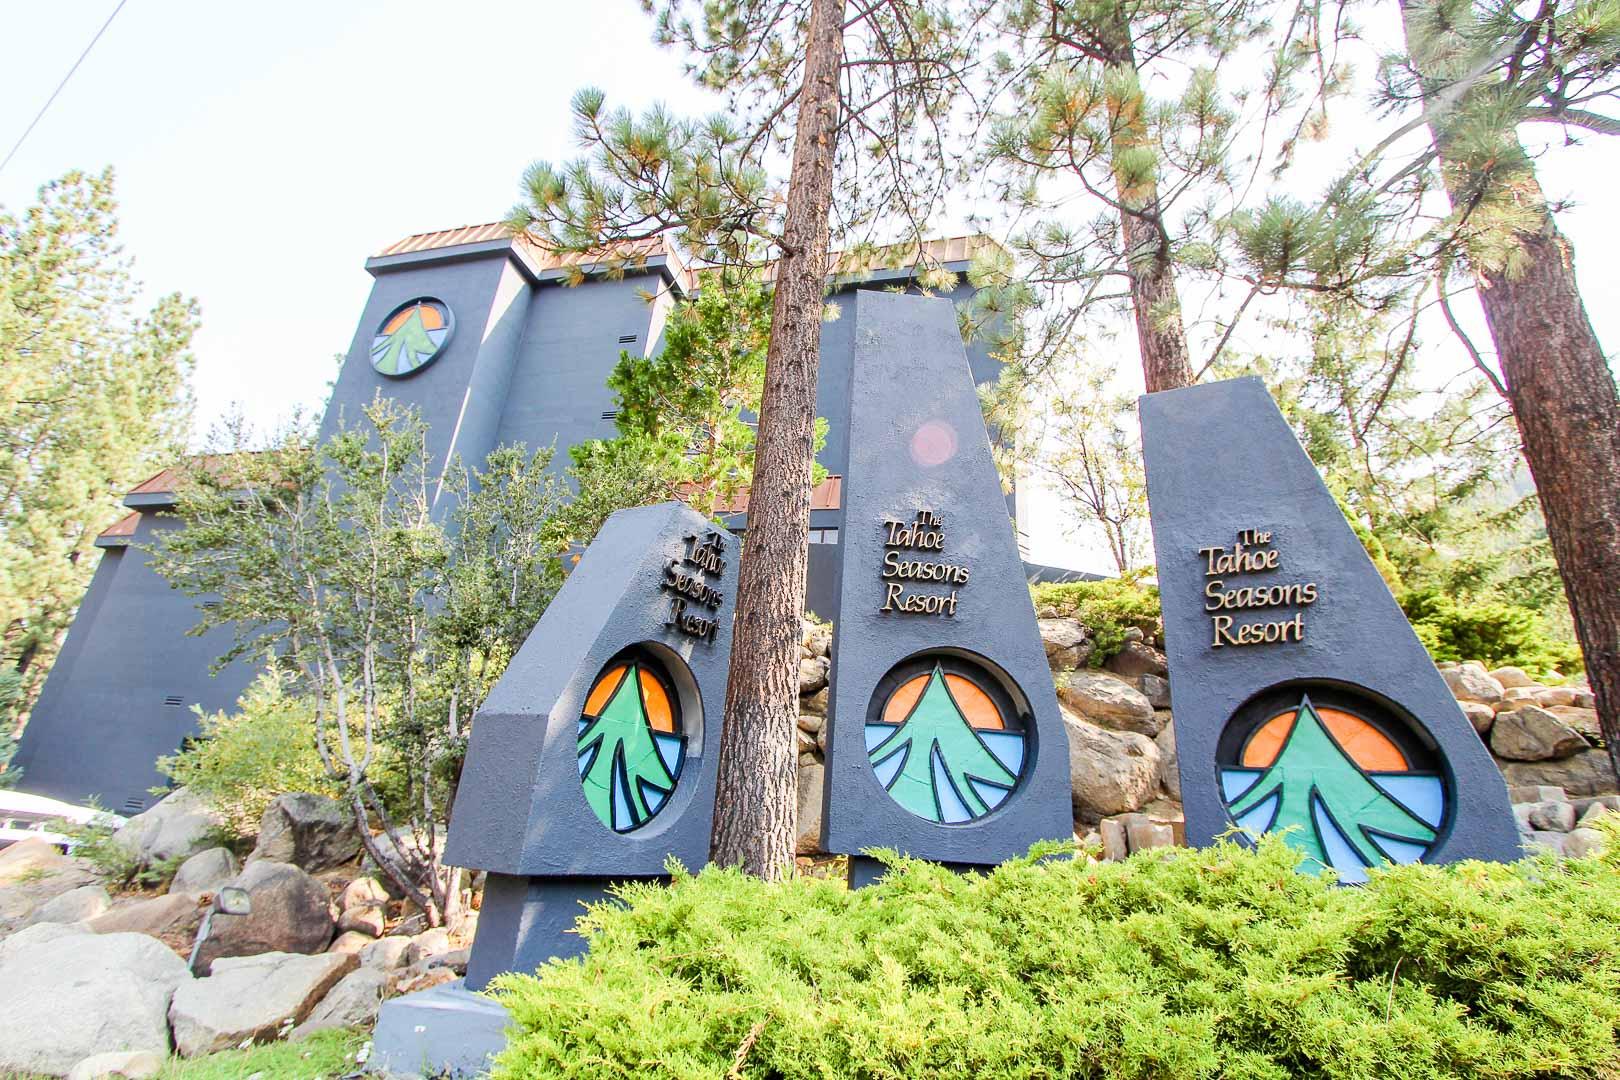 A stoic resort entrance at VRI's Tahoe Seasons Resort in California.